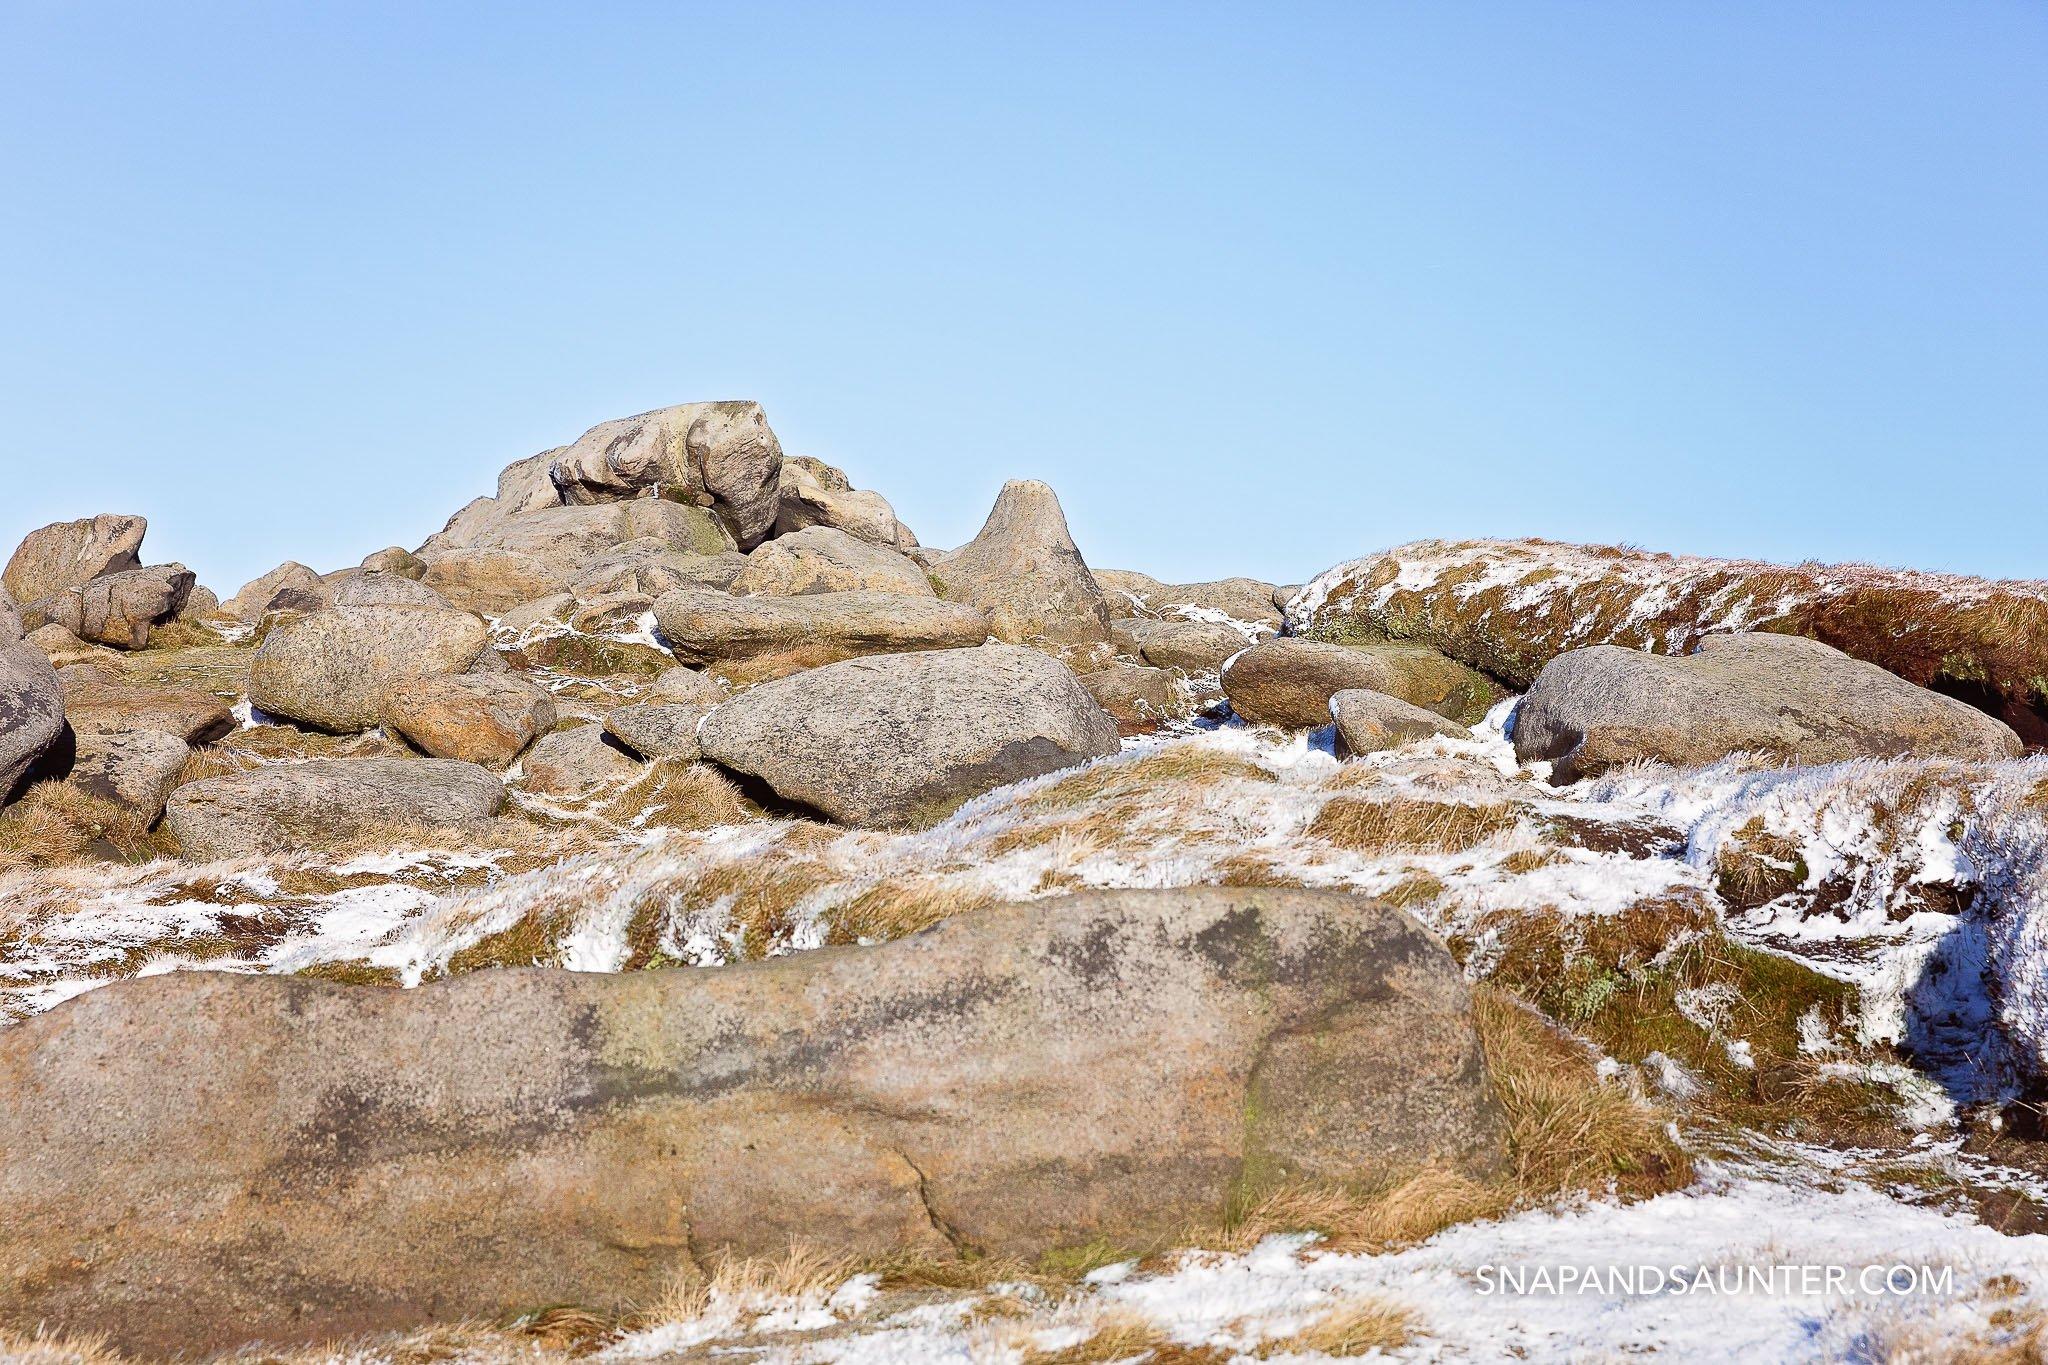 Rocks in Bleaklow in winter in Derbyshire part of the Peak District